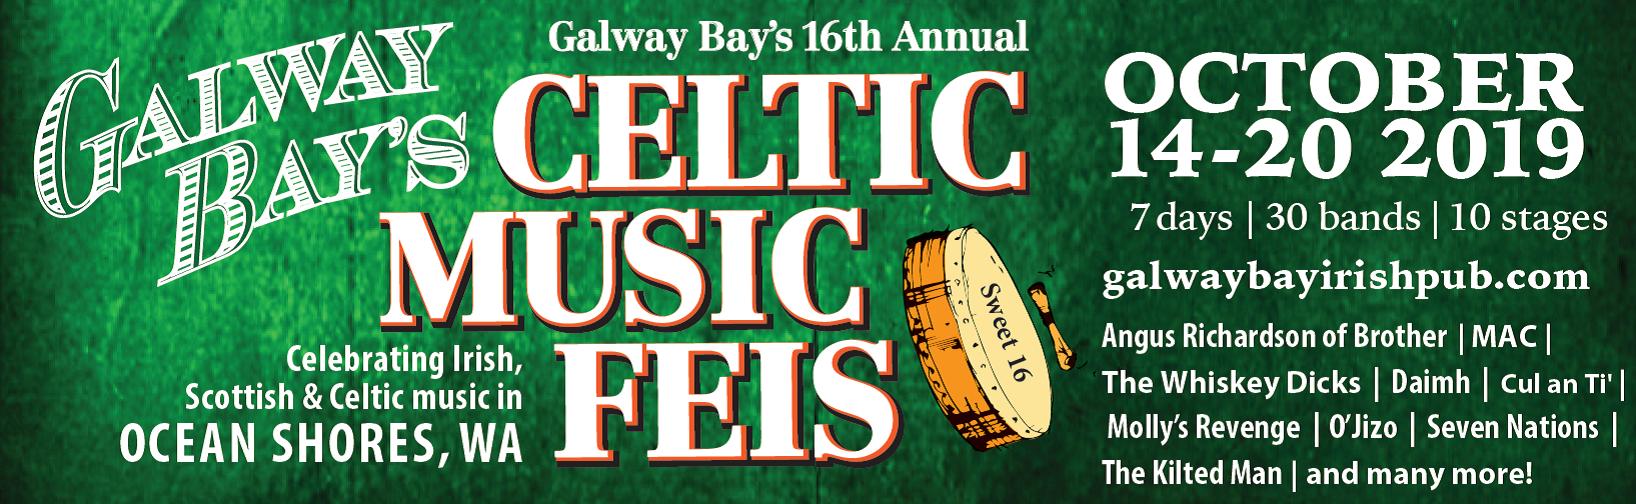 Galway Bay Irish Pub – Pacific Northwest's Largest Irish Pub